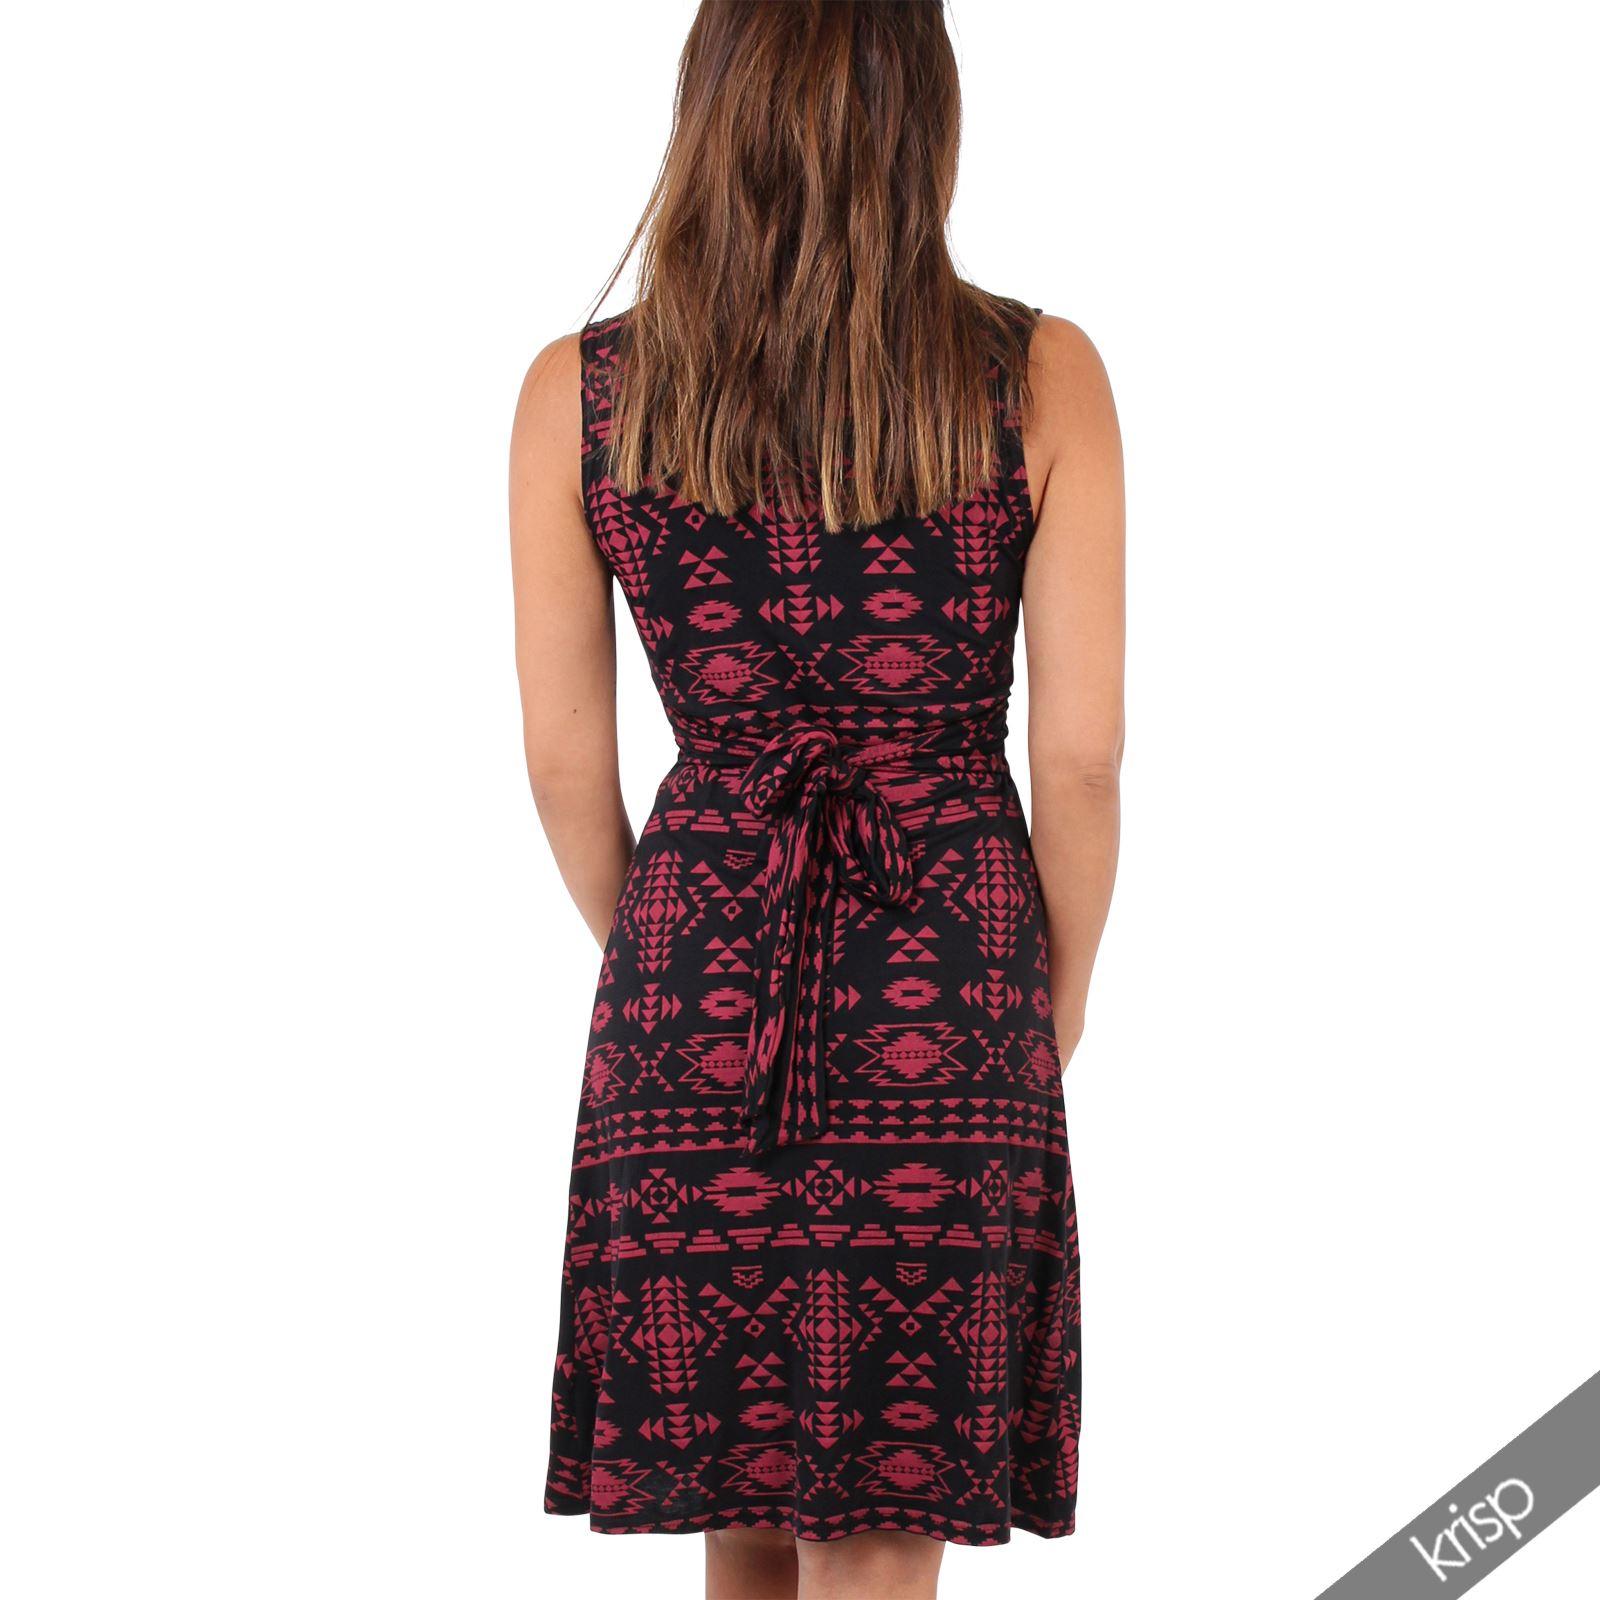 Womens-V-Neck-Mini-Dress-Small-Sizes-Short-Skirt-Tribal-Print-Front-Knot-Party thumbnail 25